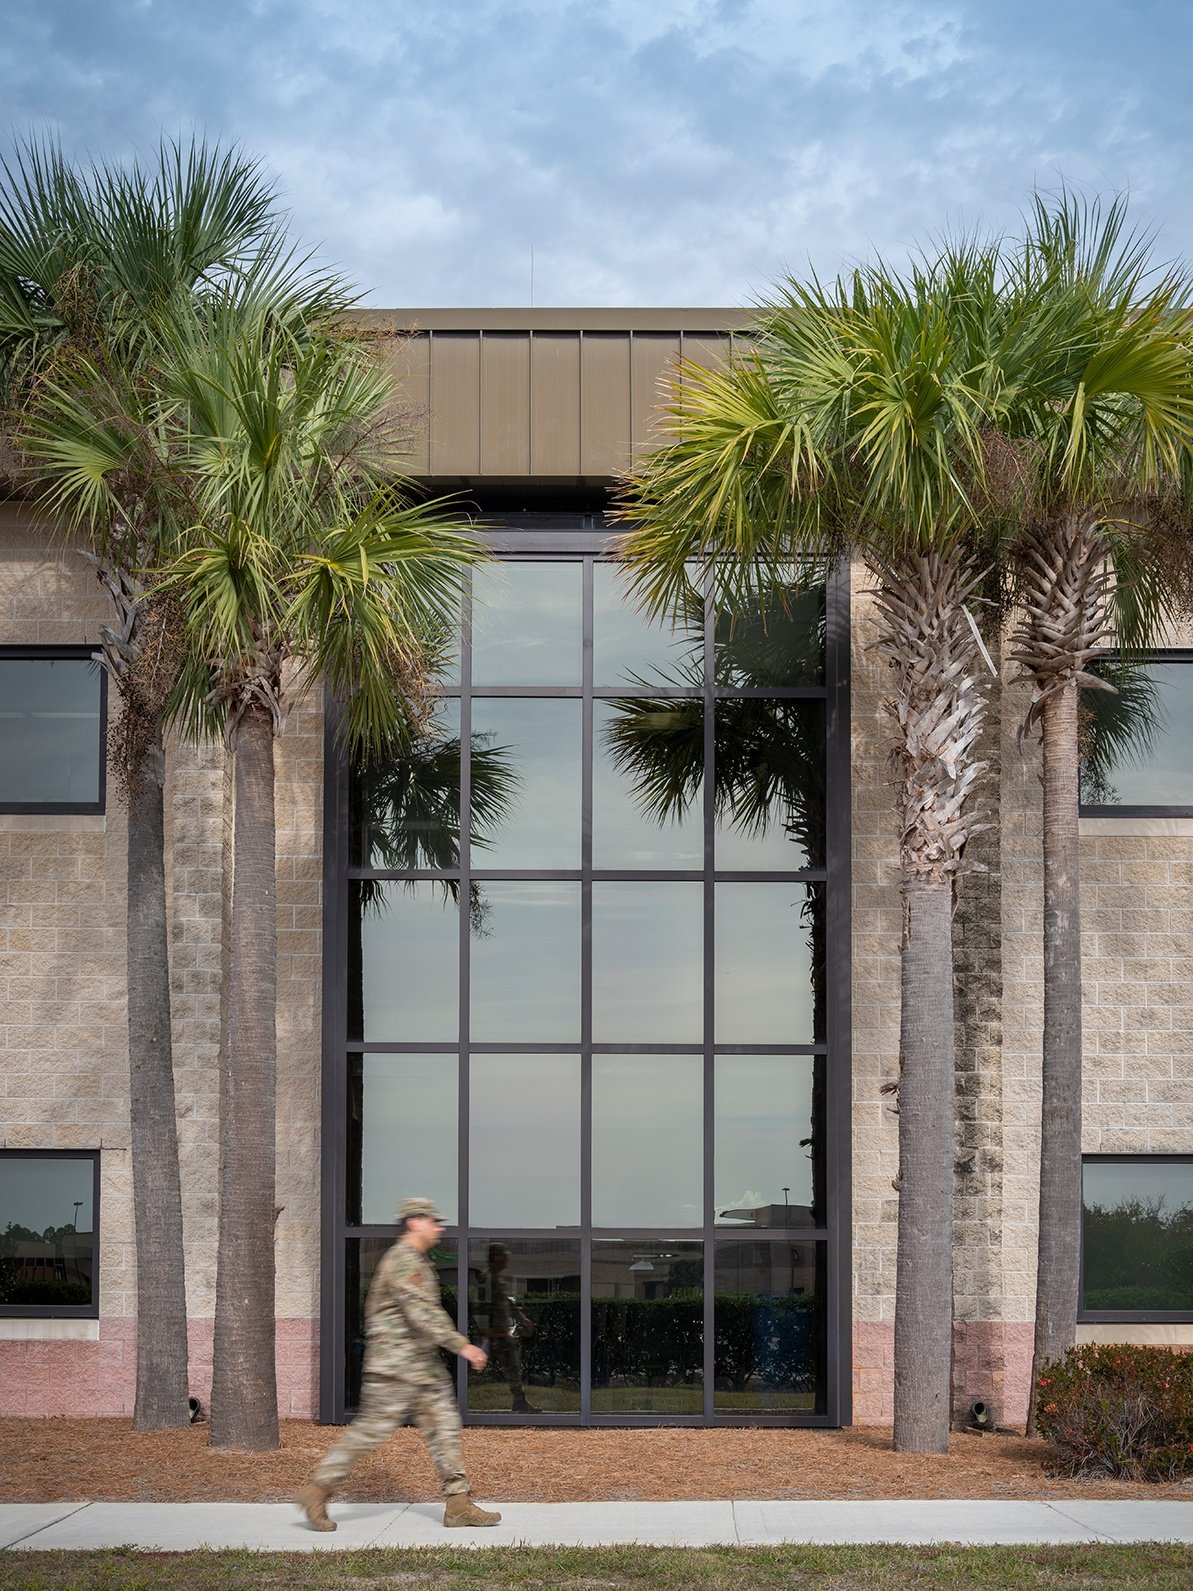 Exterior of Hurlburt Field Clinic